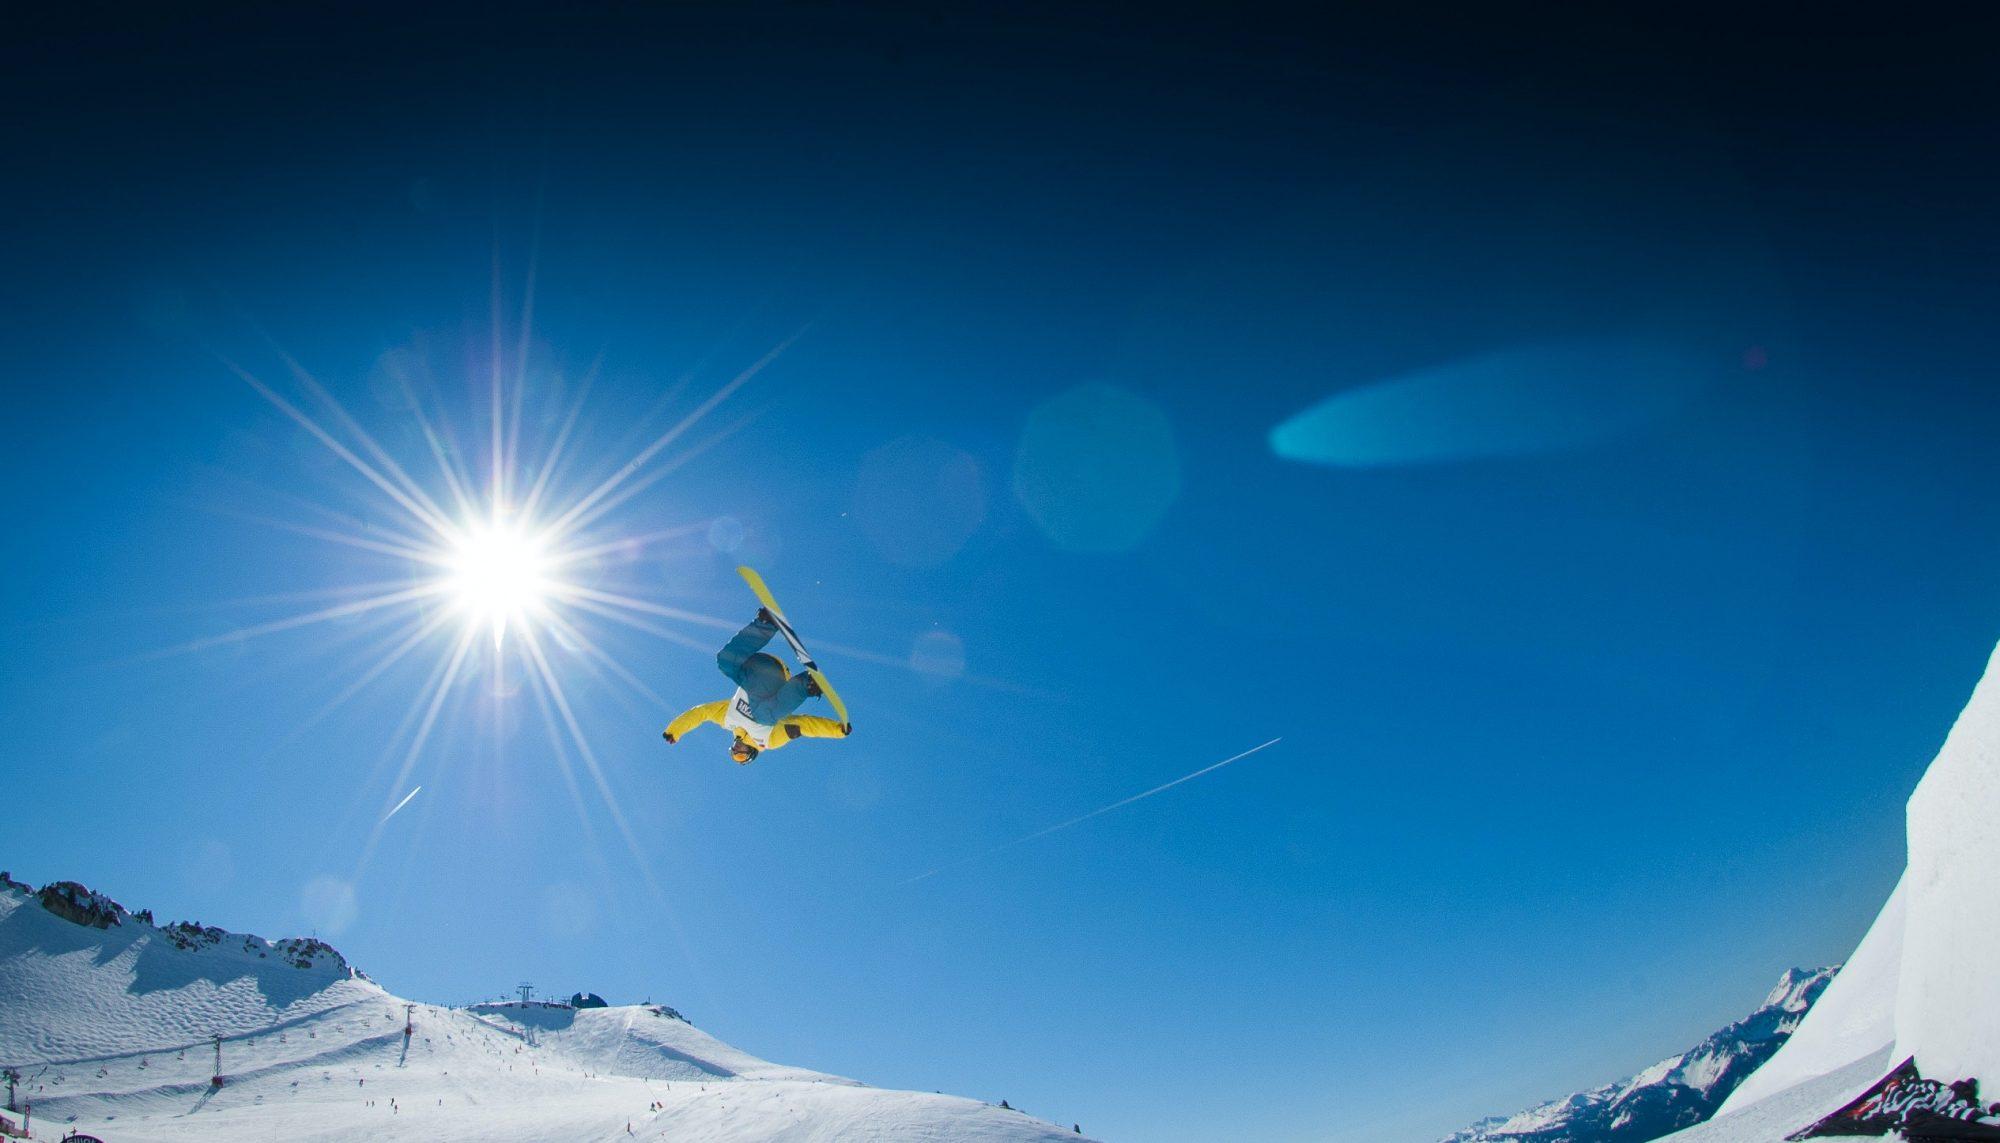 NSBA 西日本スノーボード協会